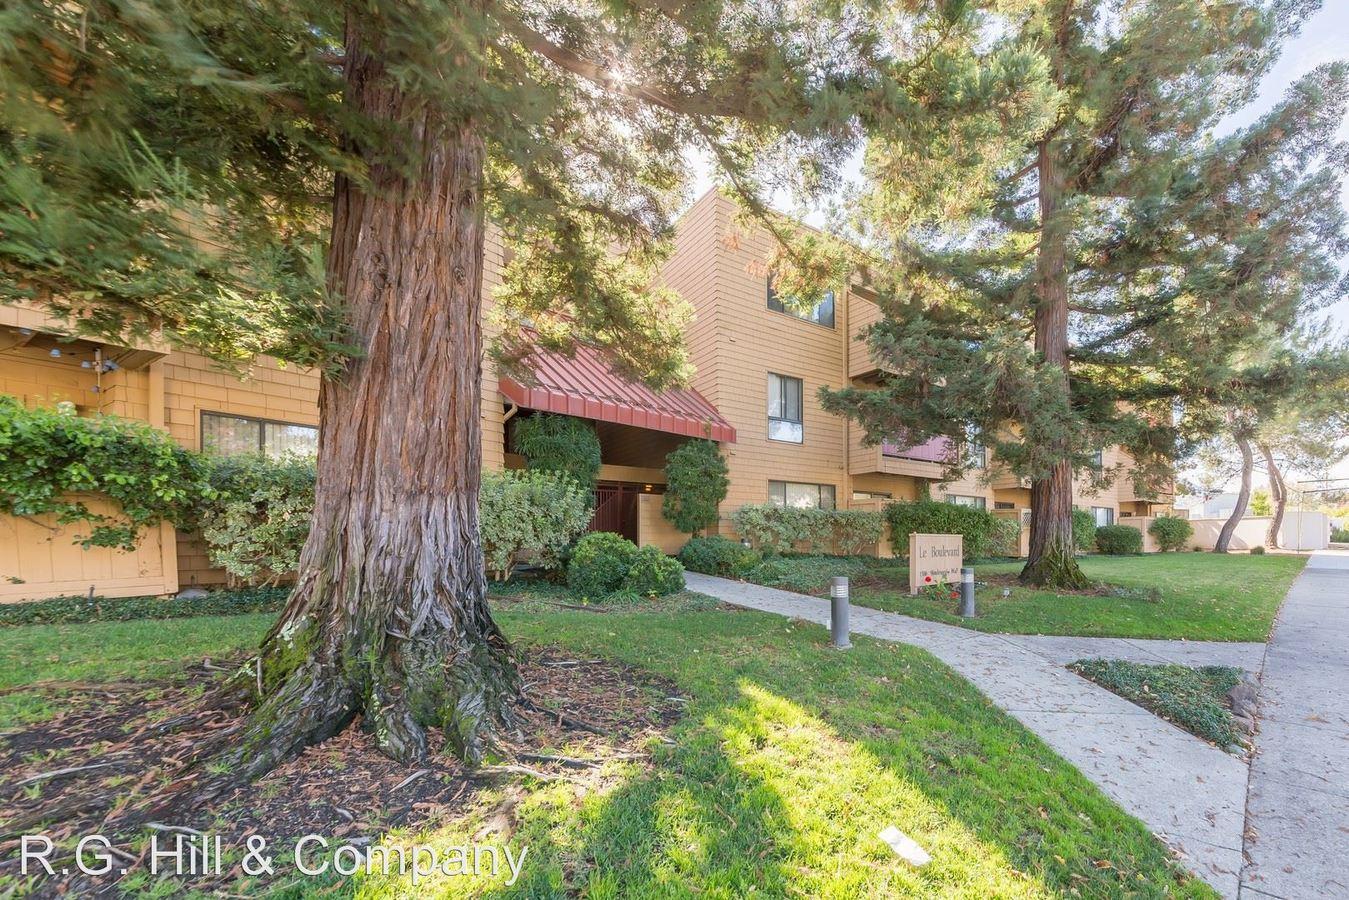 2 Bedrooms 2 Bathrooms Apartment for rent at 1336 Boulevard Way in Walnut Creek, CA